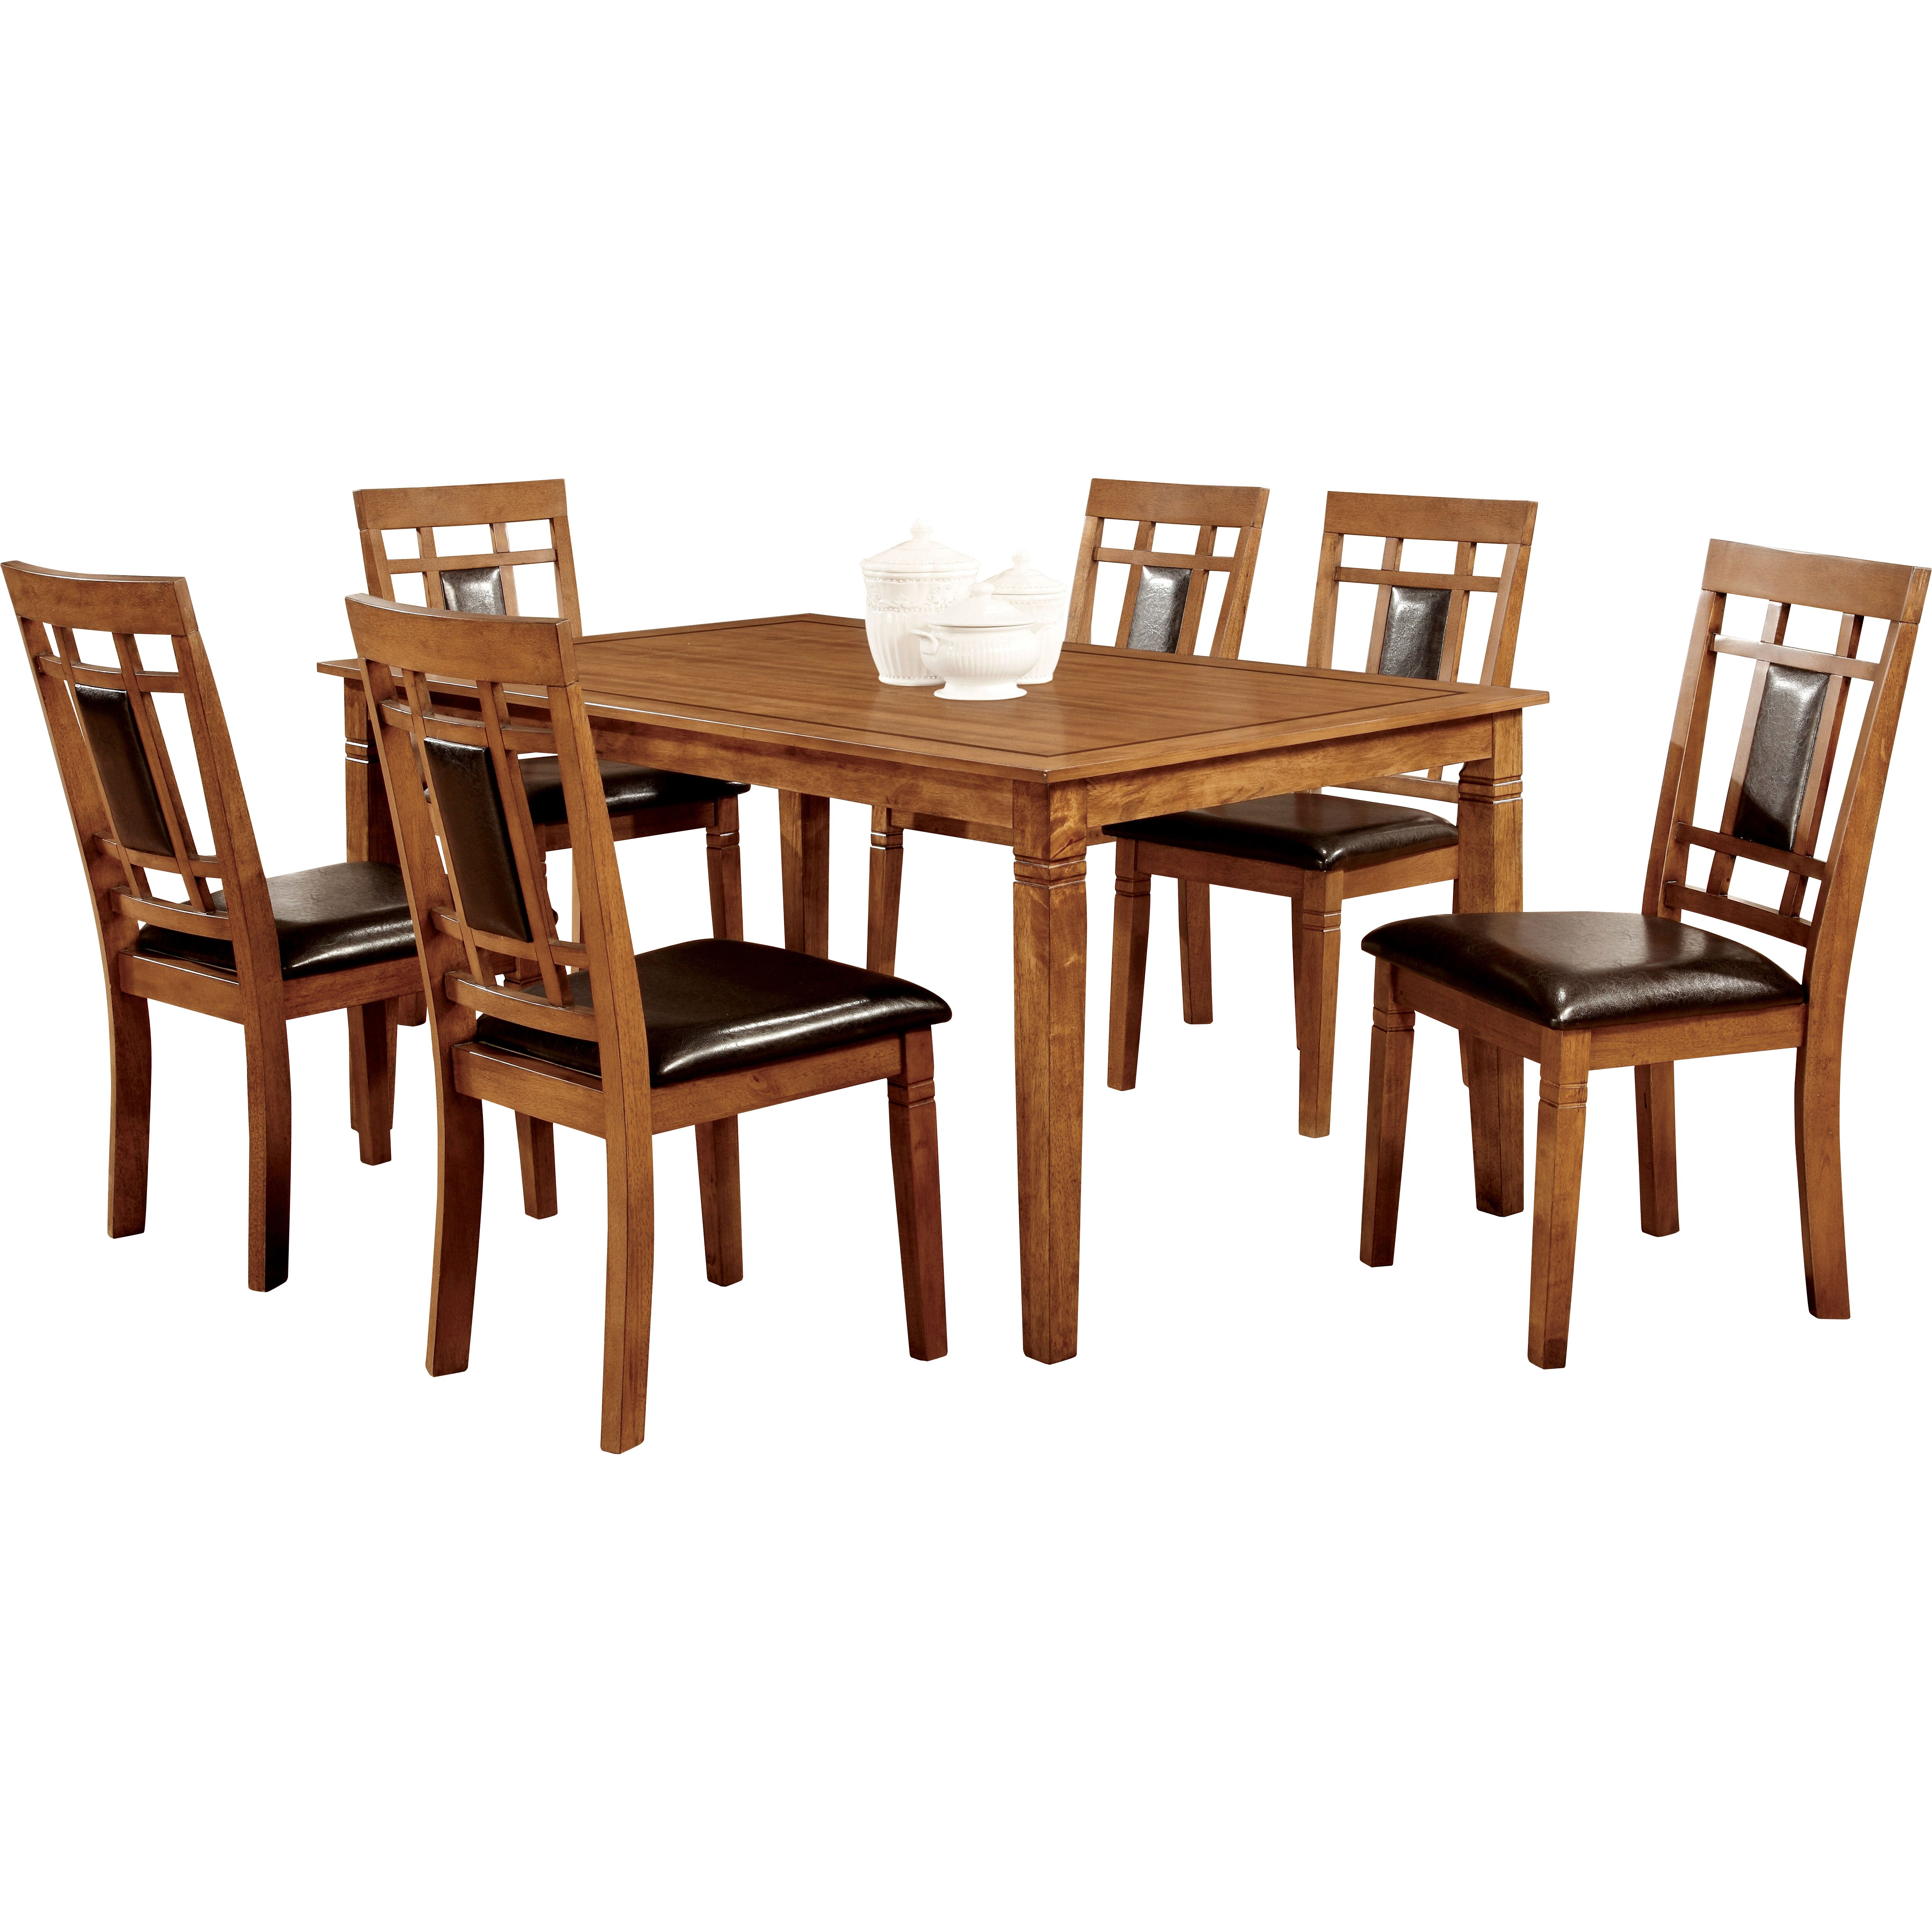 Hokku designs molina 7 piece dining set reviews wayfair for Hokku designs dining room furniture